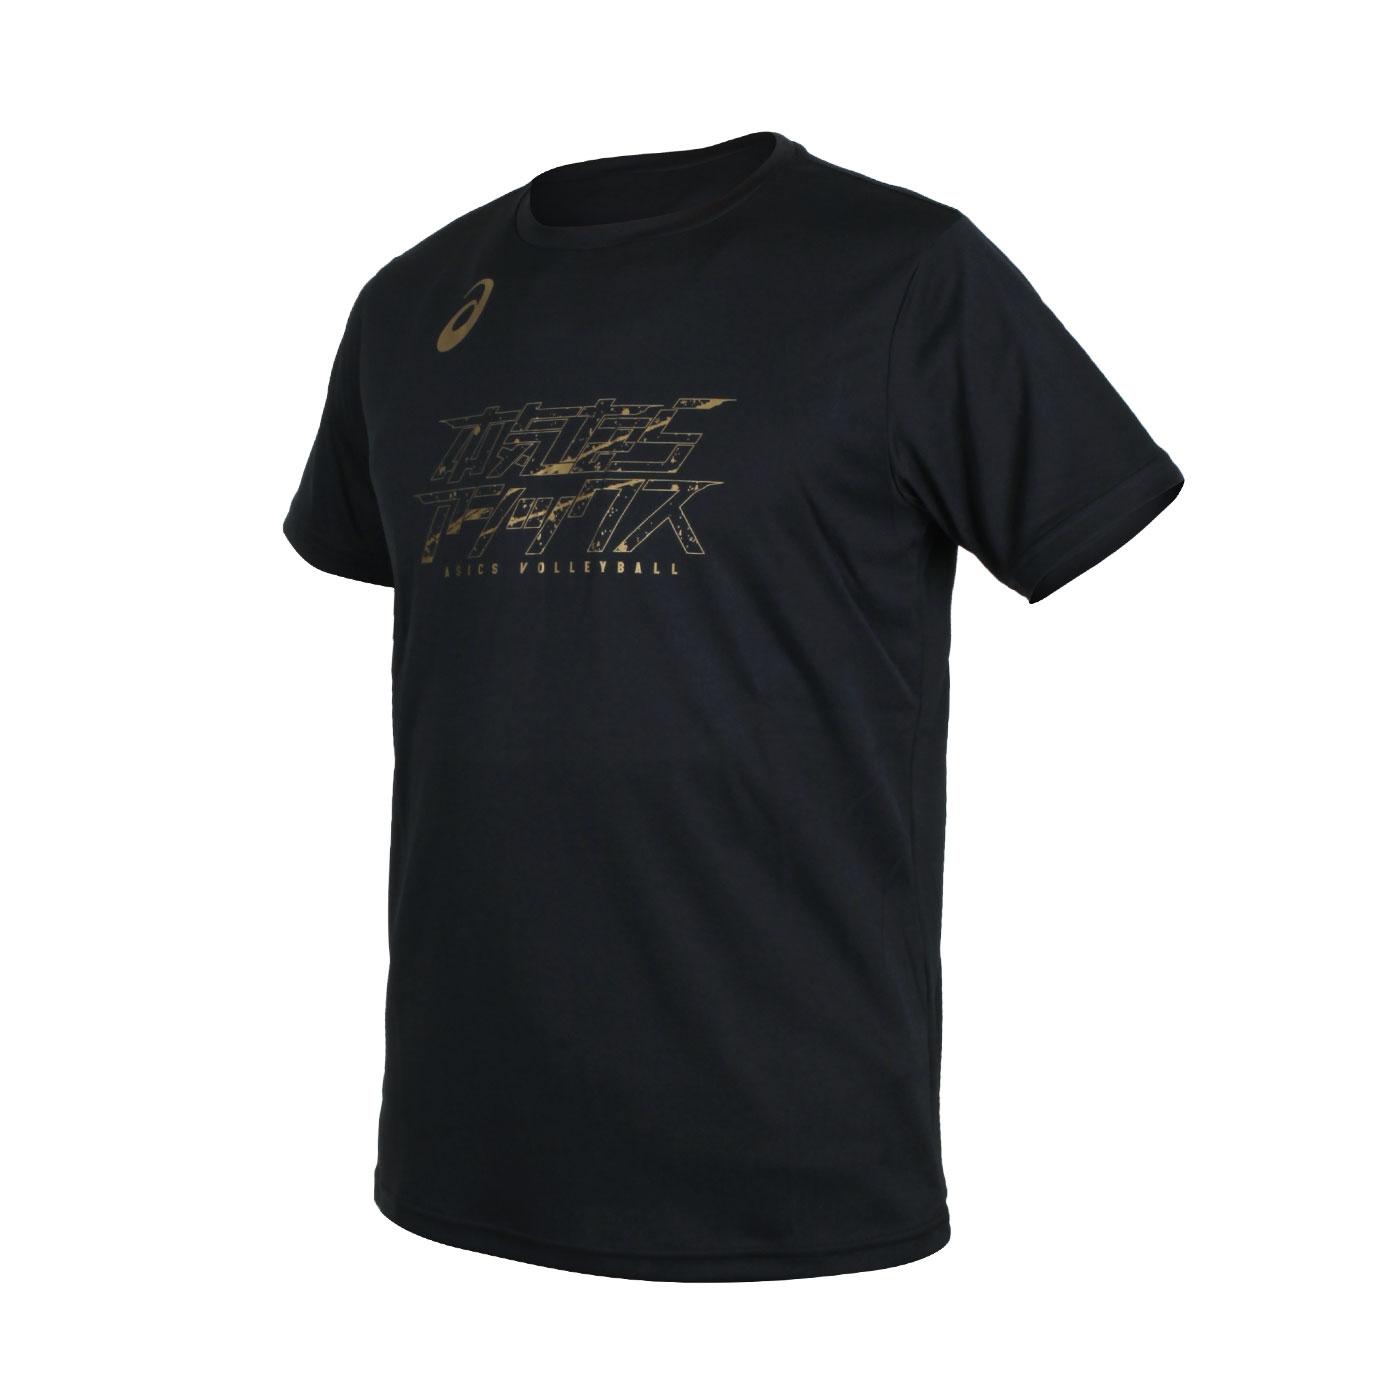 ASICS 男款短袖T恤 2051A296-003 - 黑金